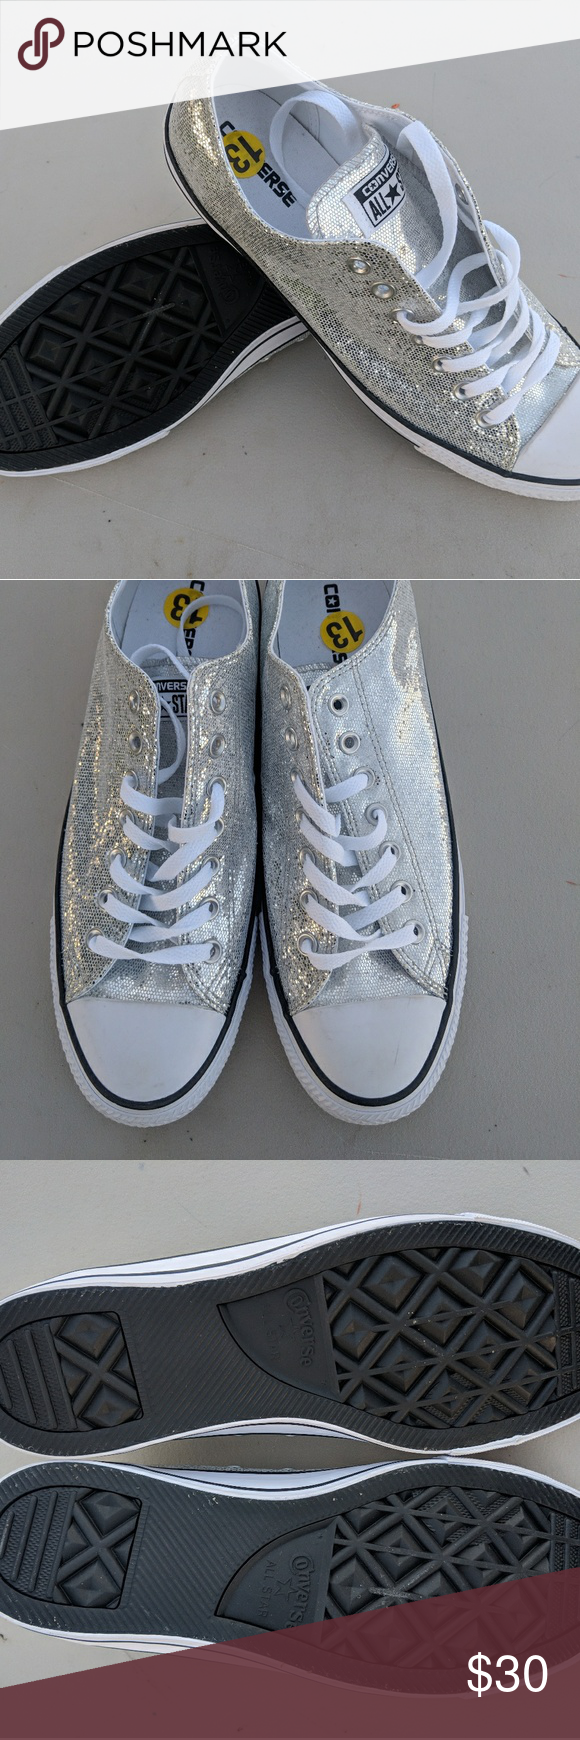 8266f143000d Converse AllStar Silver Glitter Chuck Taylor 11 13 Converse All-Star Silver  Glitter Chuck Taylor